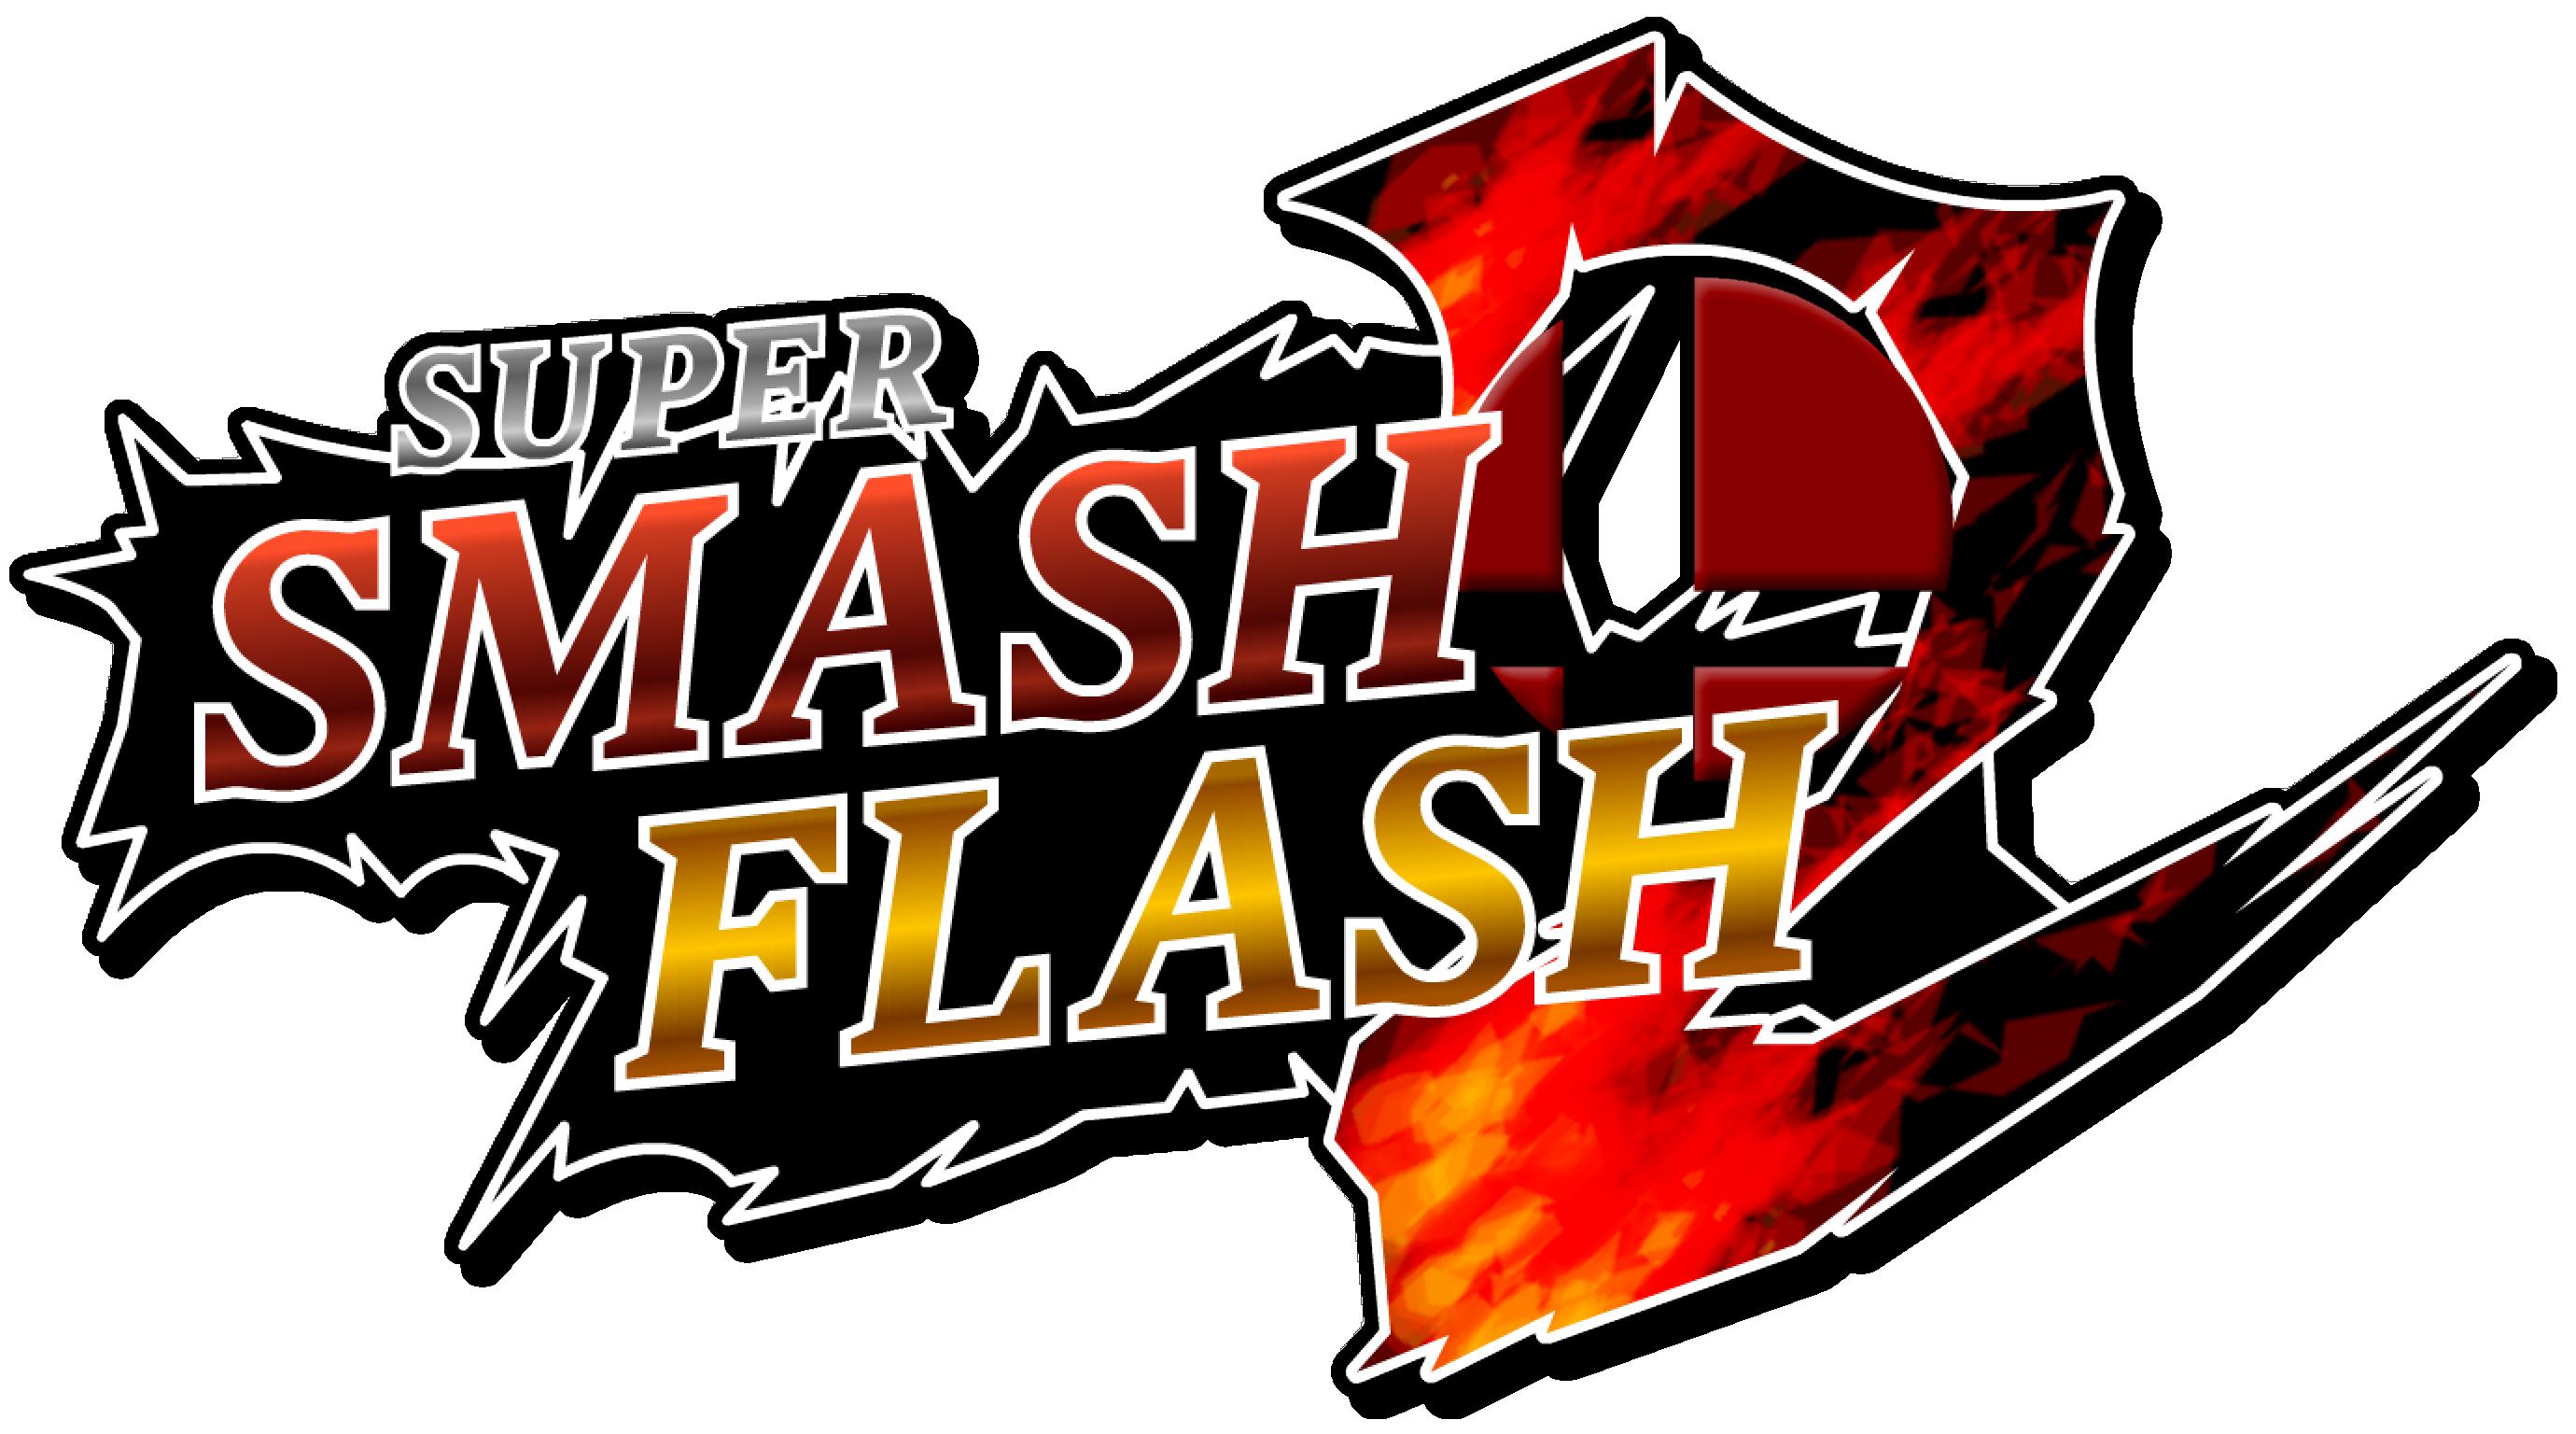 Super Smash Flash 2 Windows, Mac, Linux game - Mod DB